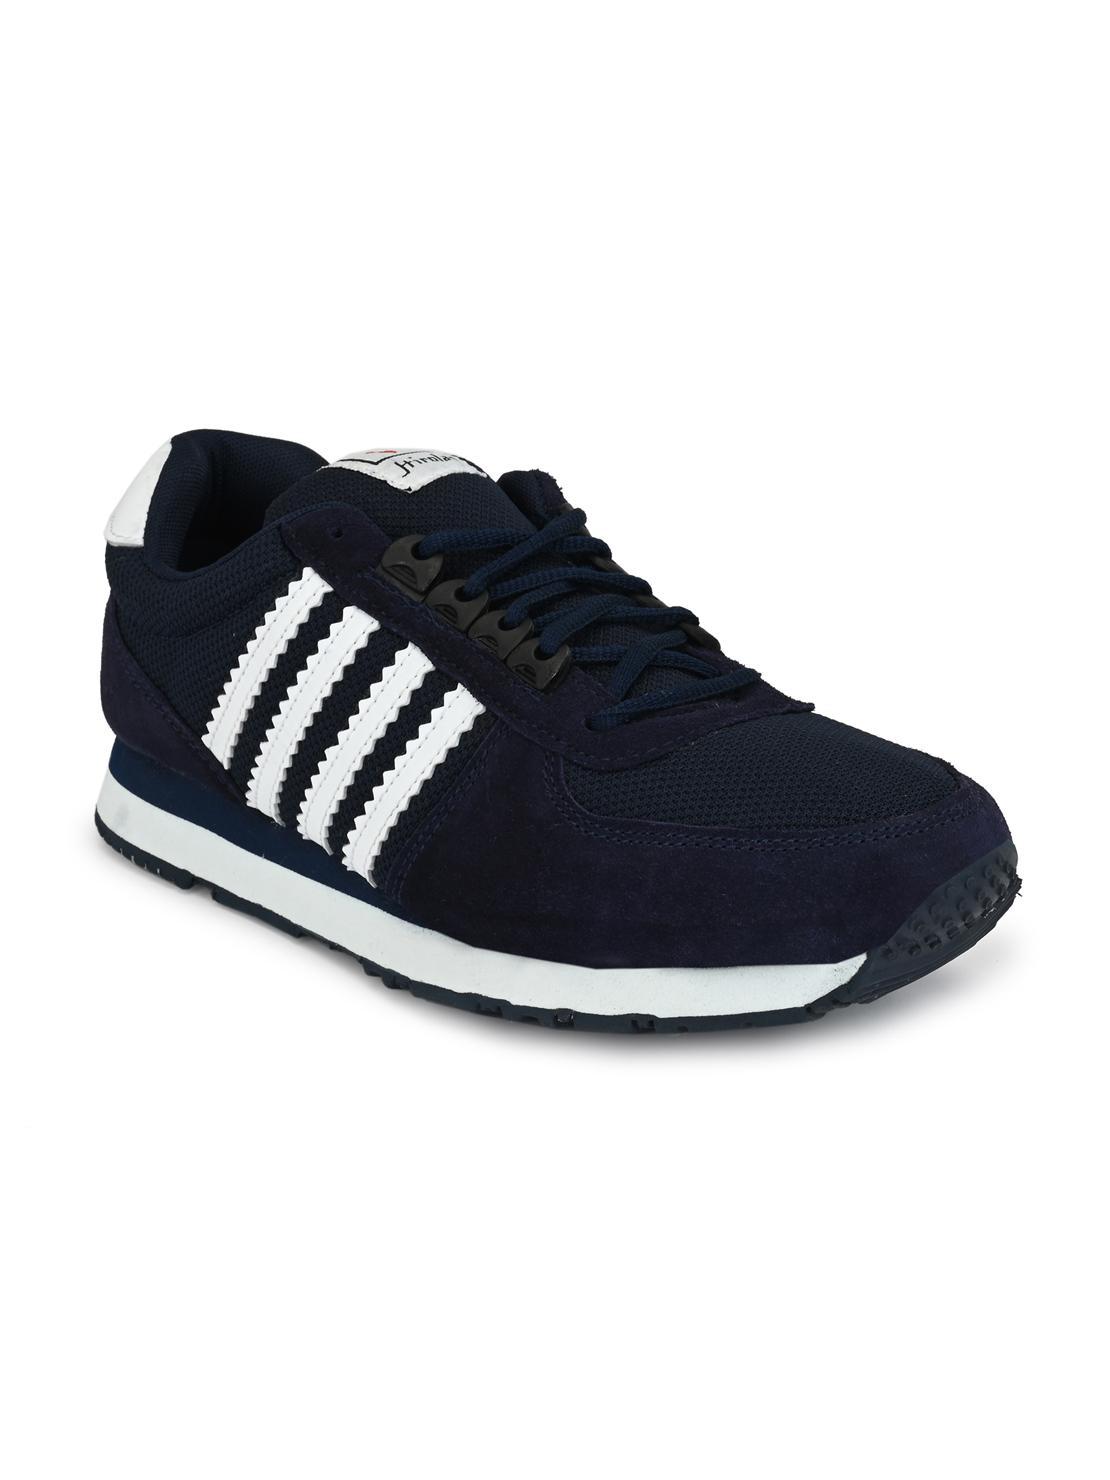 Hirolas | Hirolas Men's Multisport Leather Sneaker Shoes- Blue/White